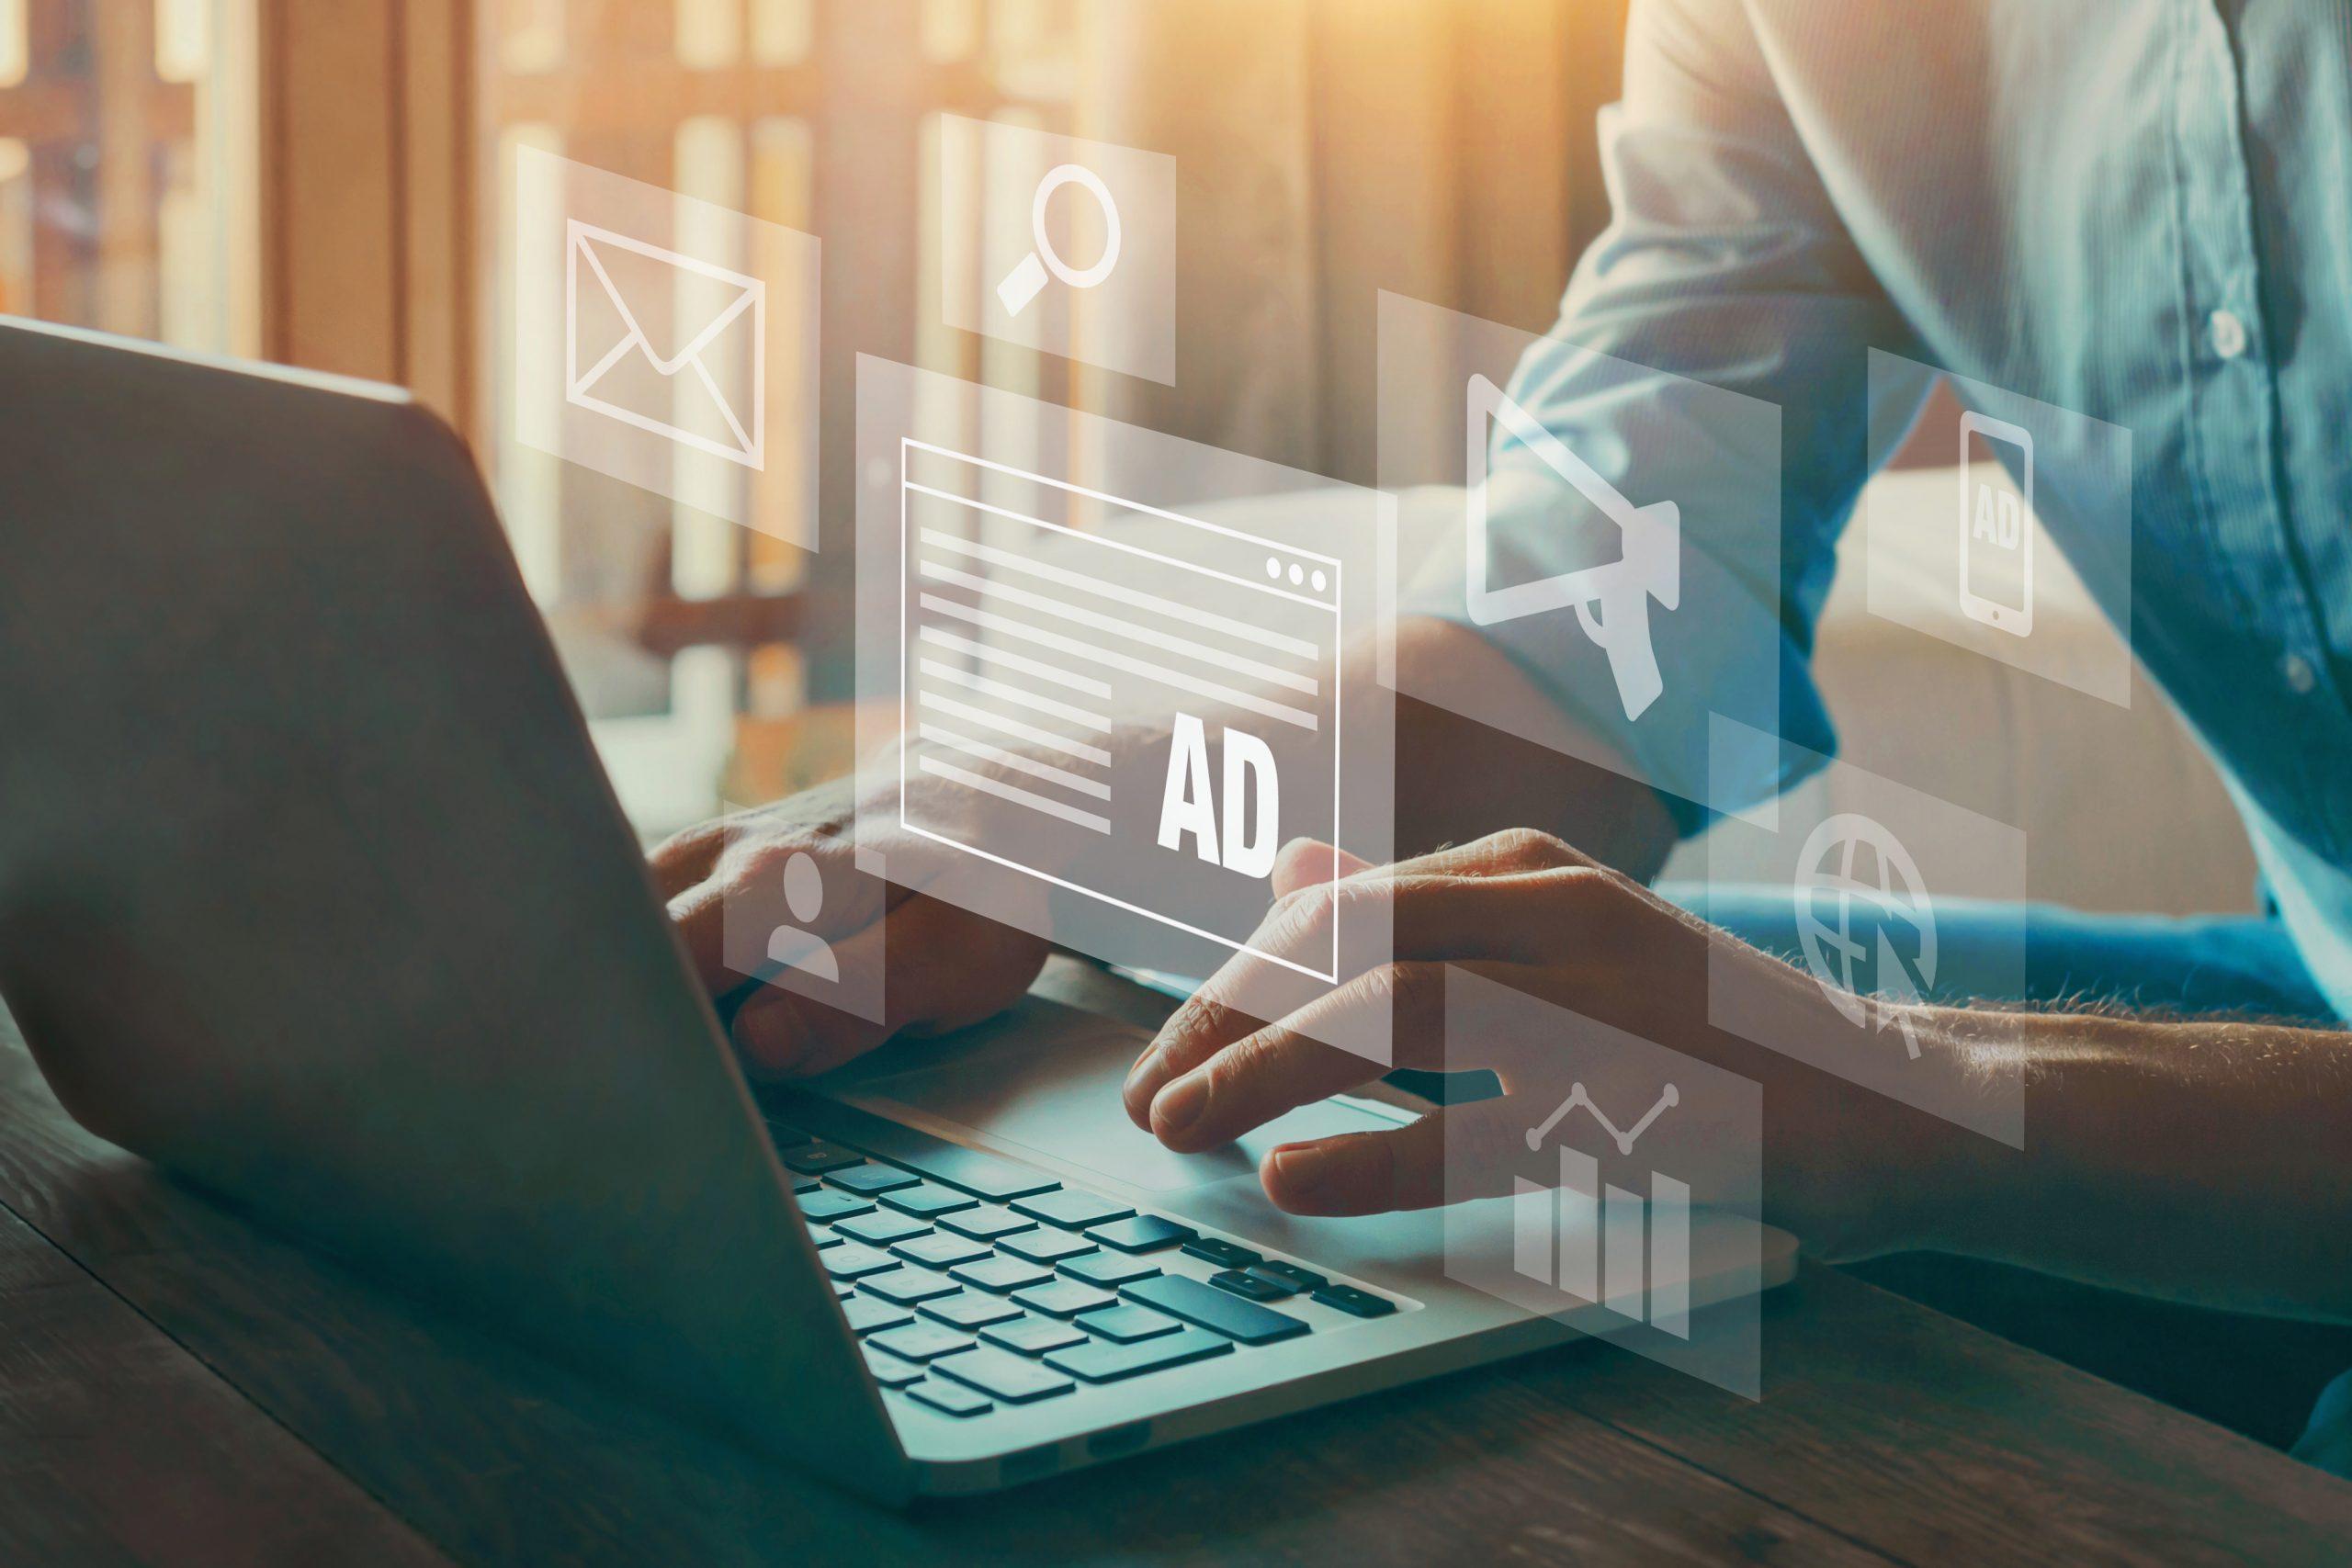 digital marketing concept, online advertisement